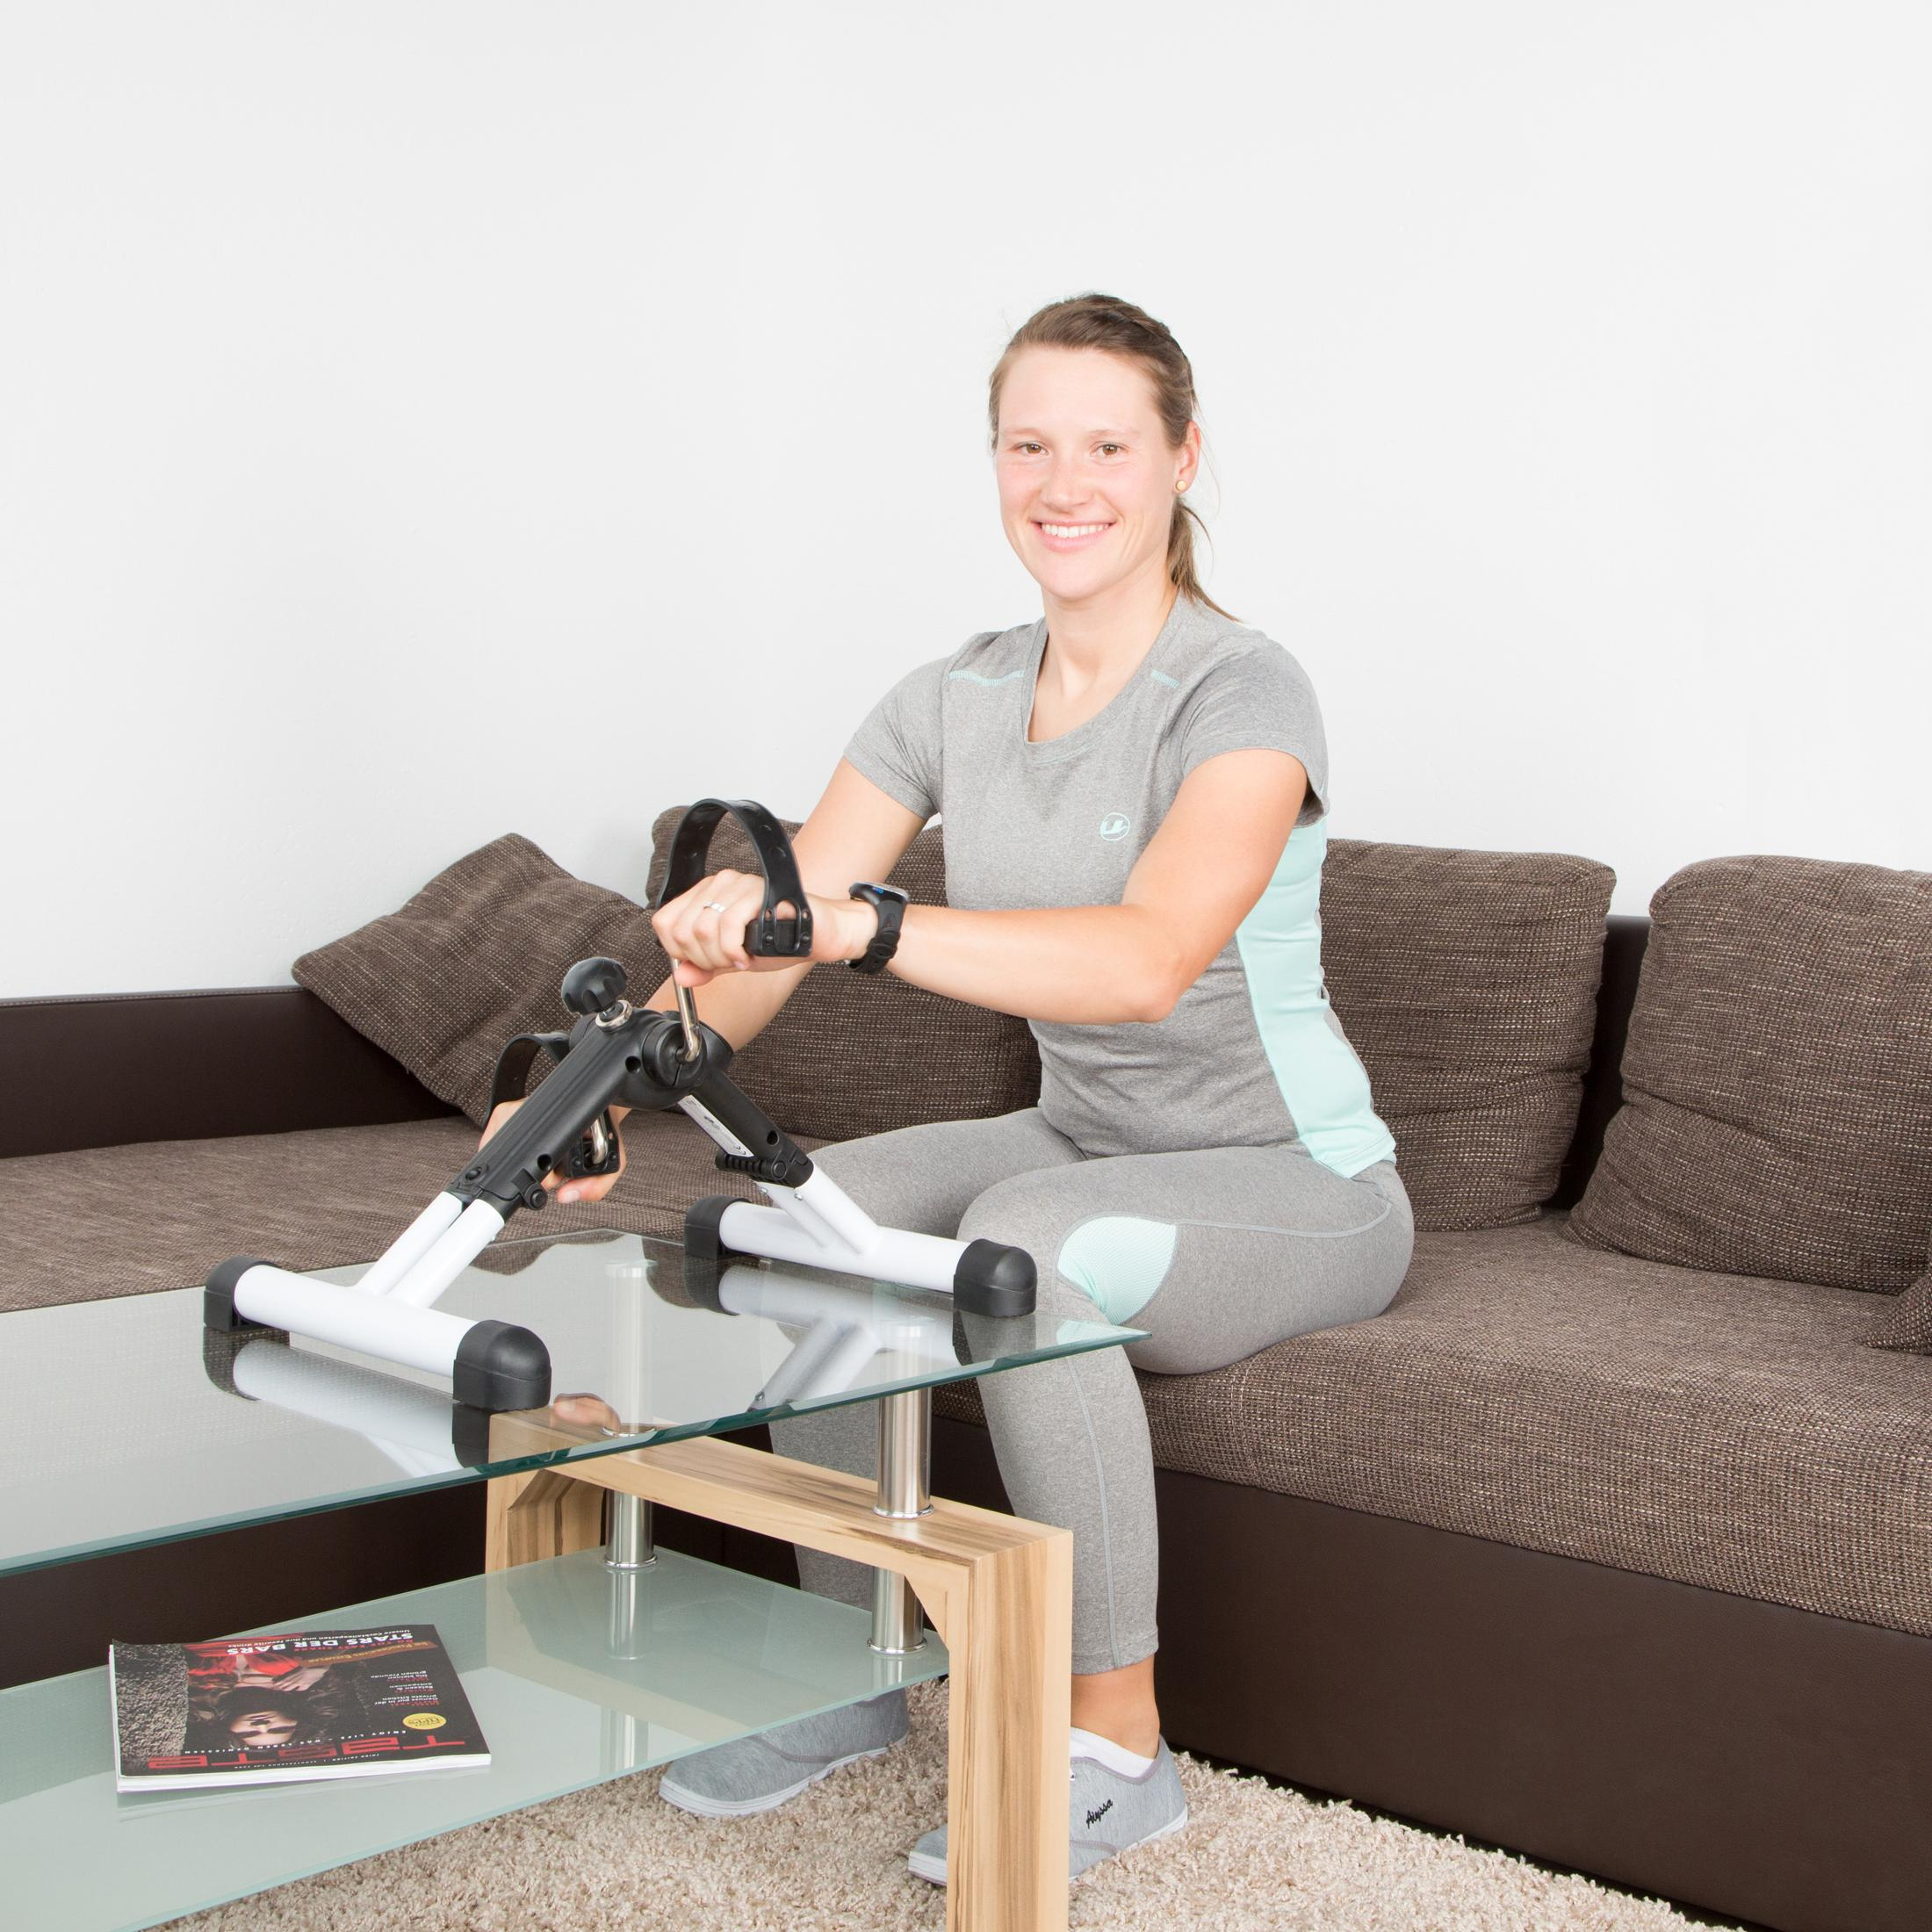 ultrasport mpe 25 klappbares mini fahrrad mini bike heimtrainer f r arm beintraining. Black Bedroom Furniture Sets. Home Design Ideas